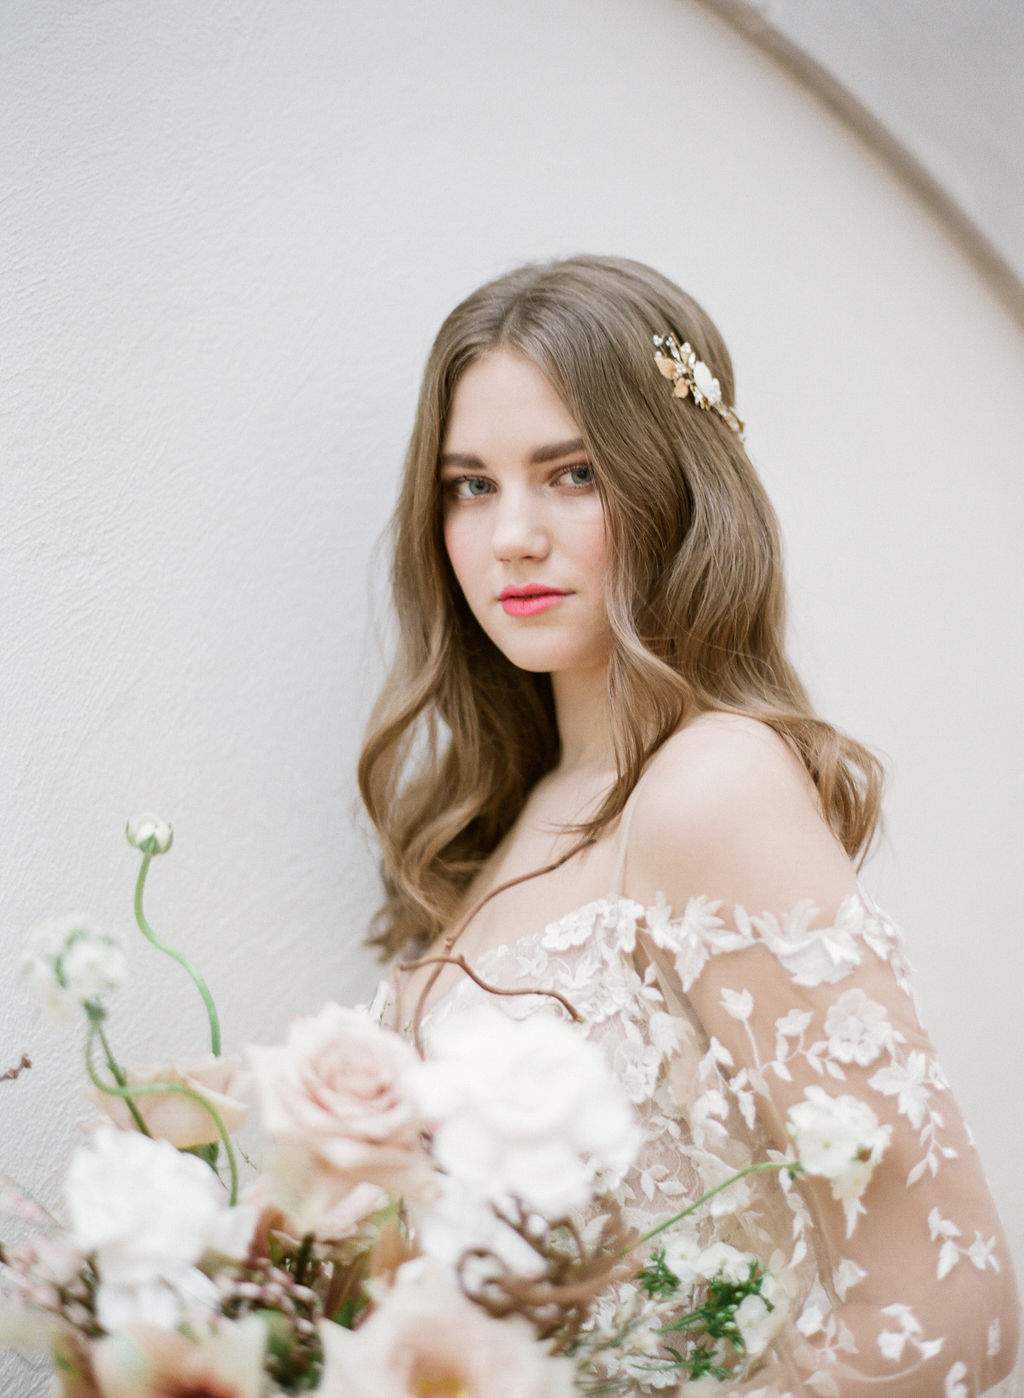 artiese-ago-wedding-editorial-000423700007.jpg